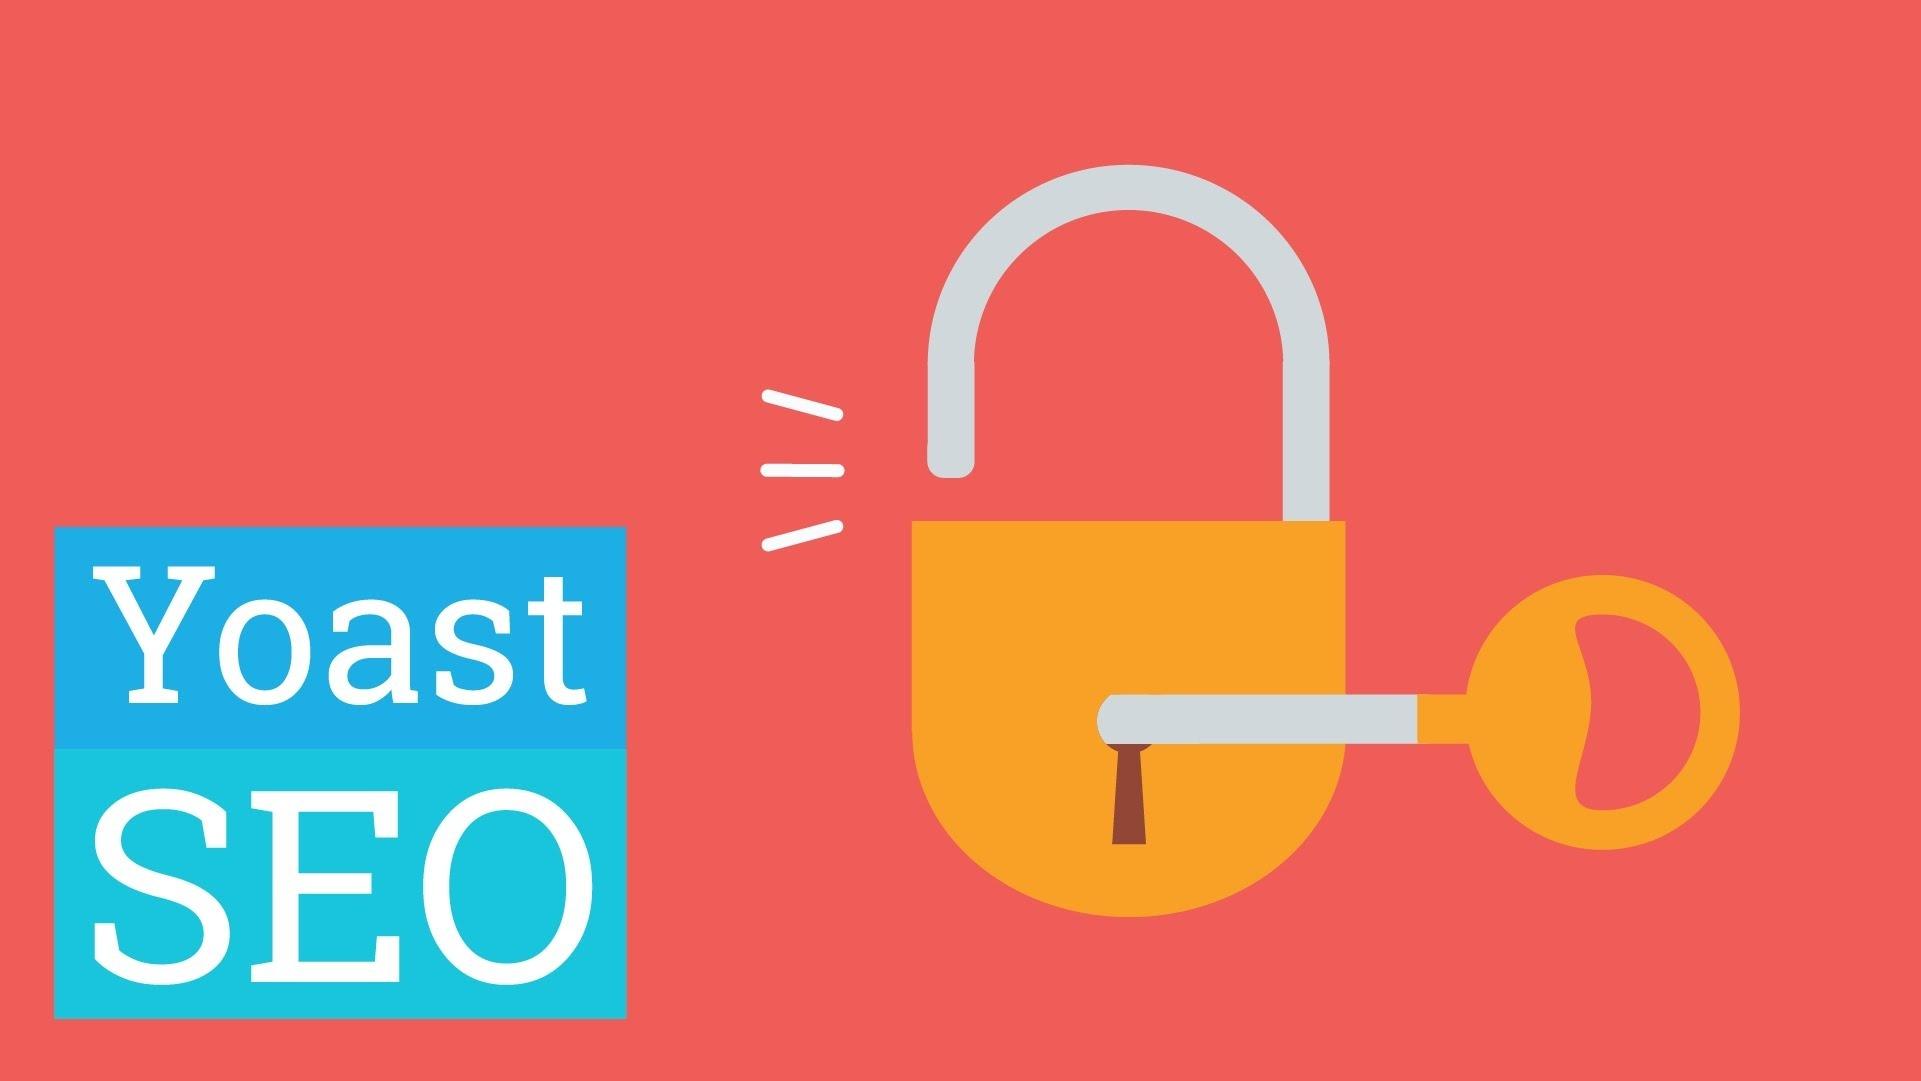 Yoast SEO - плагин для поисковой оптимизации для WordPress